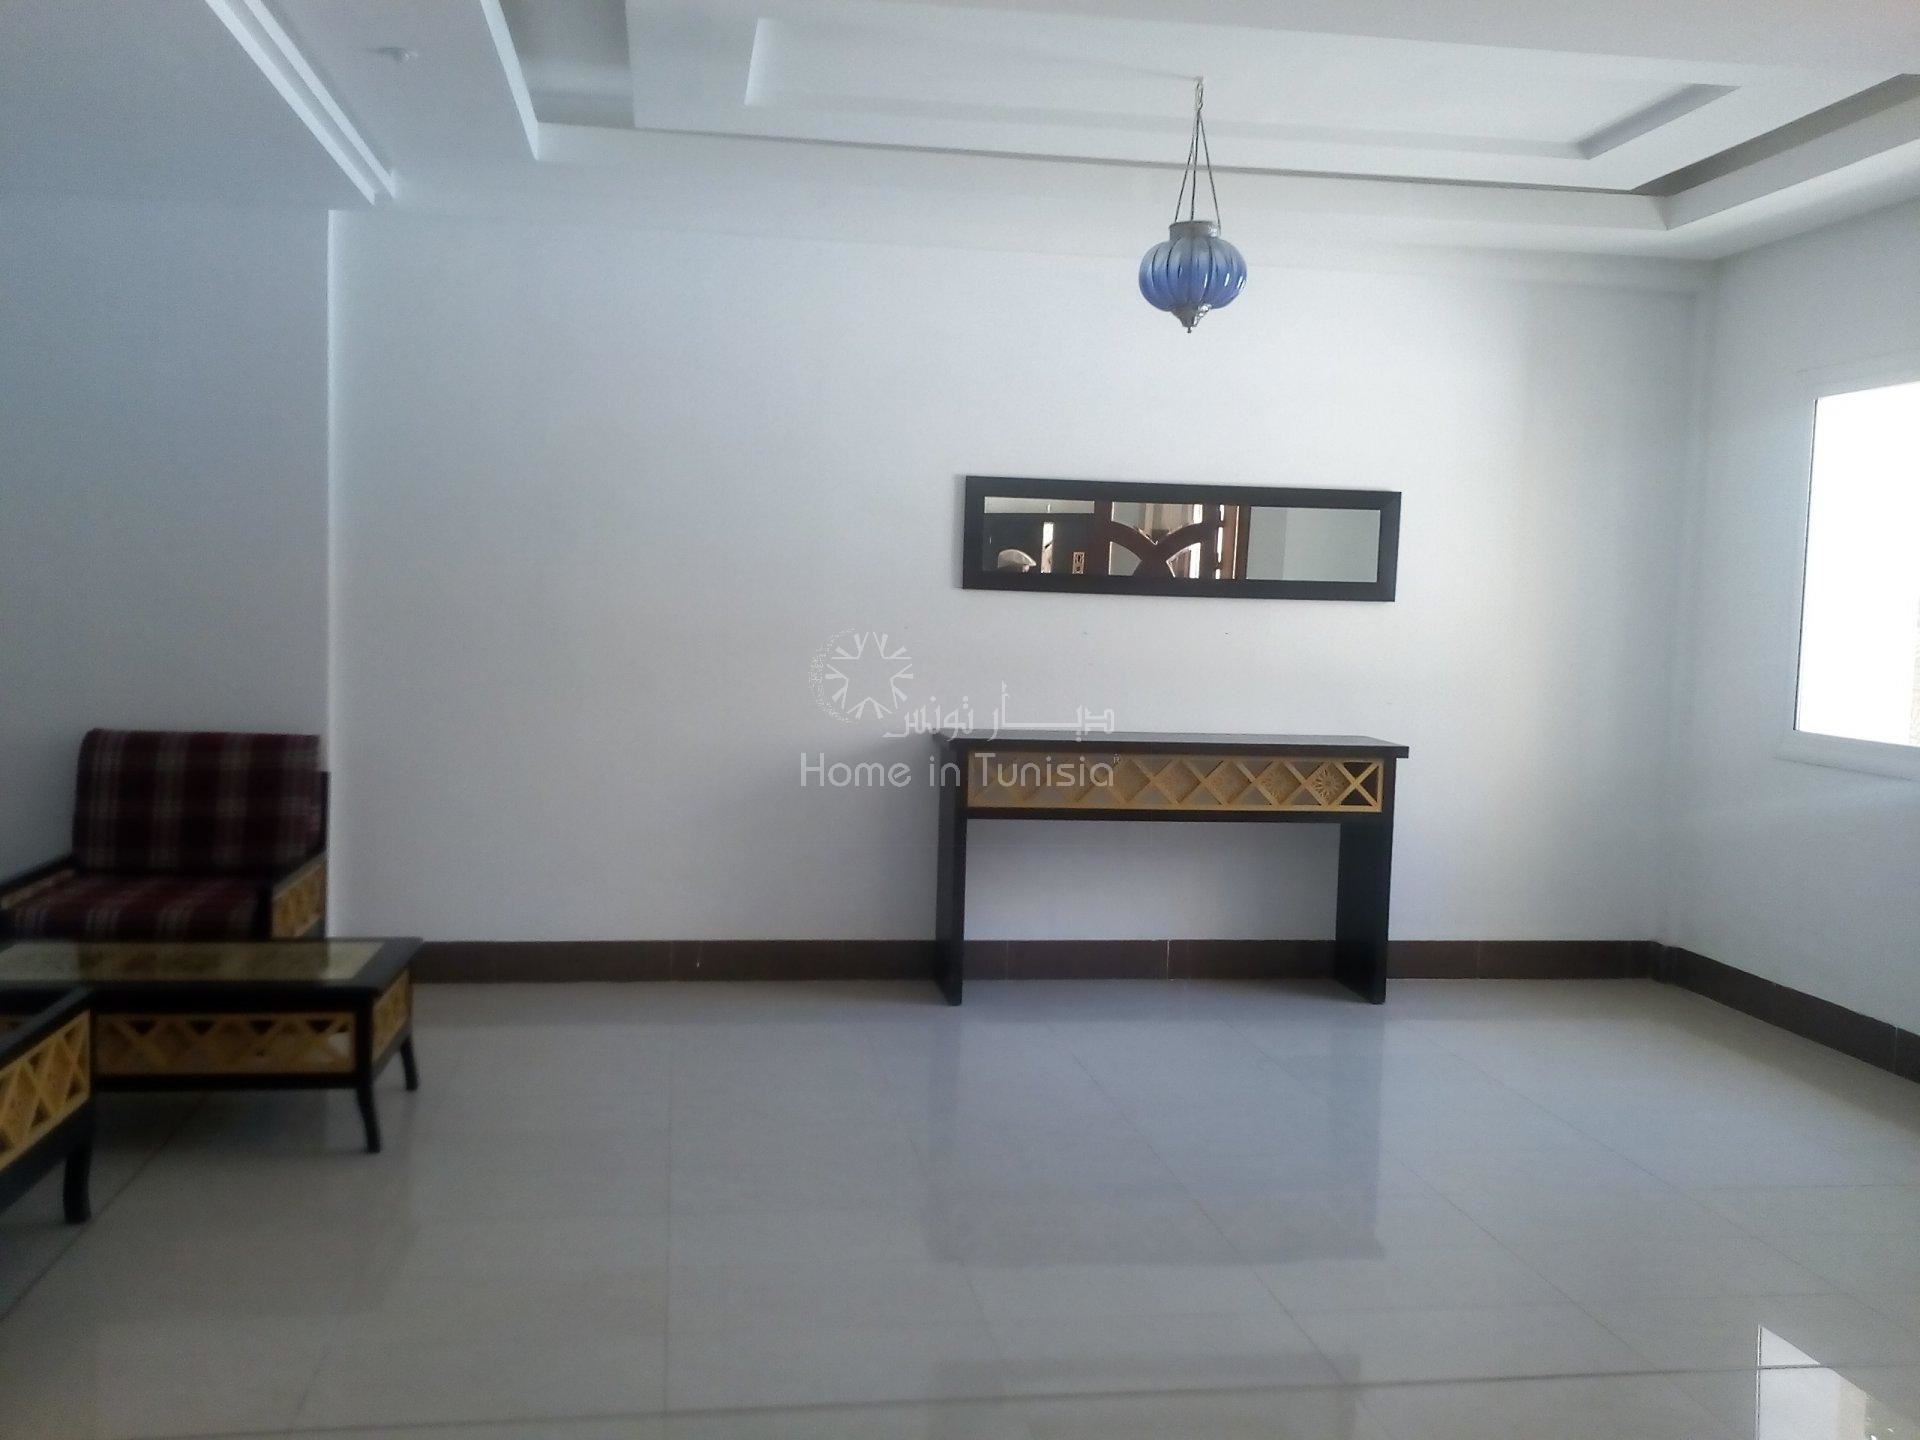 joli ppartement s+1 a vendre